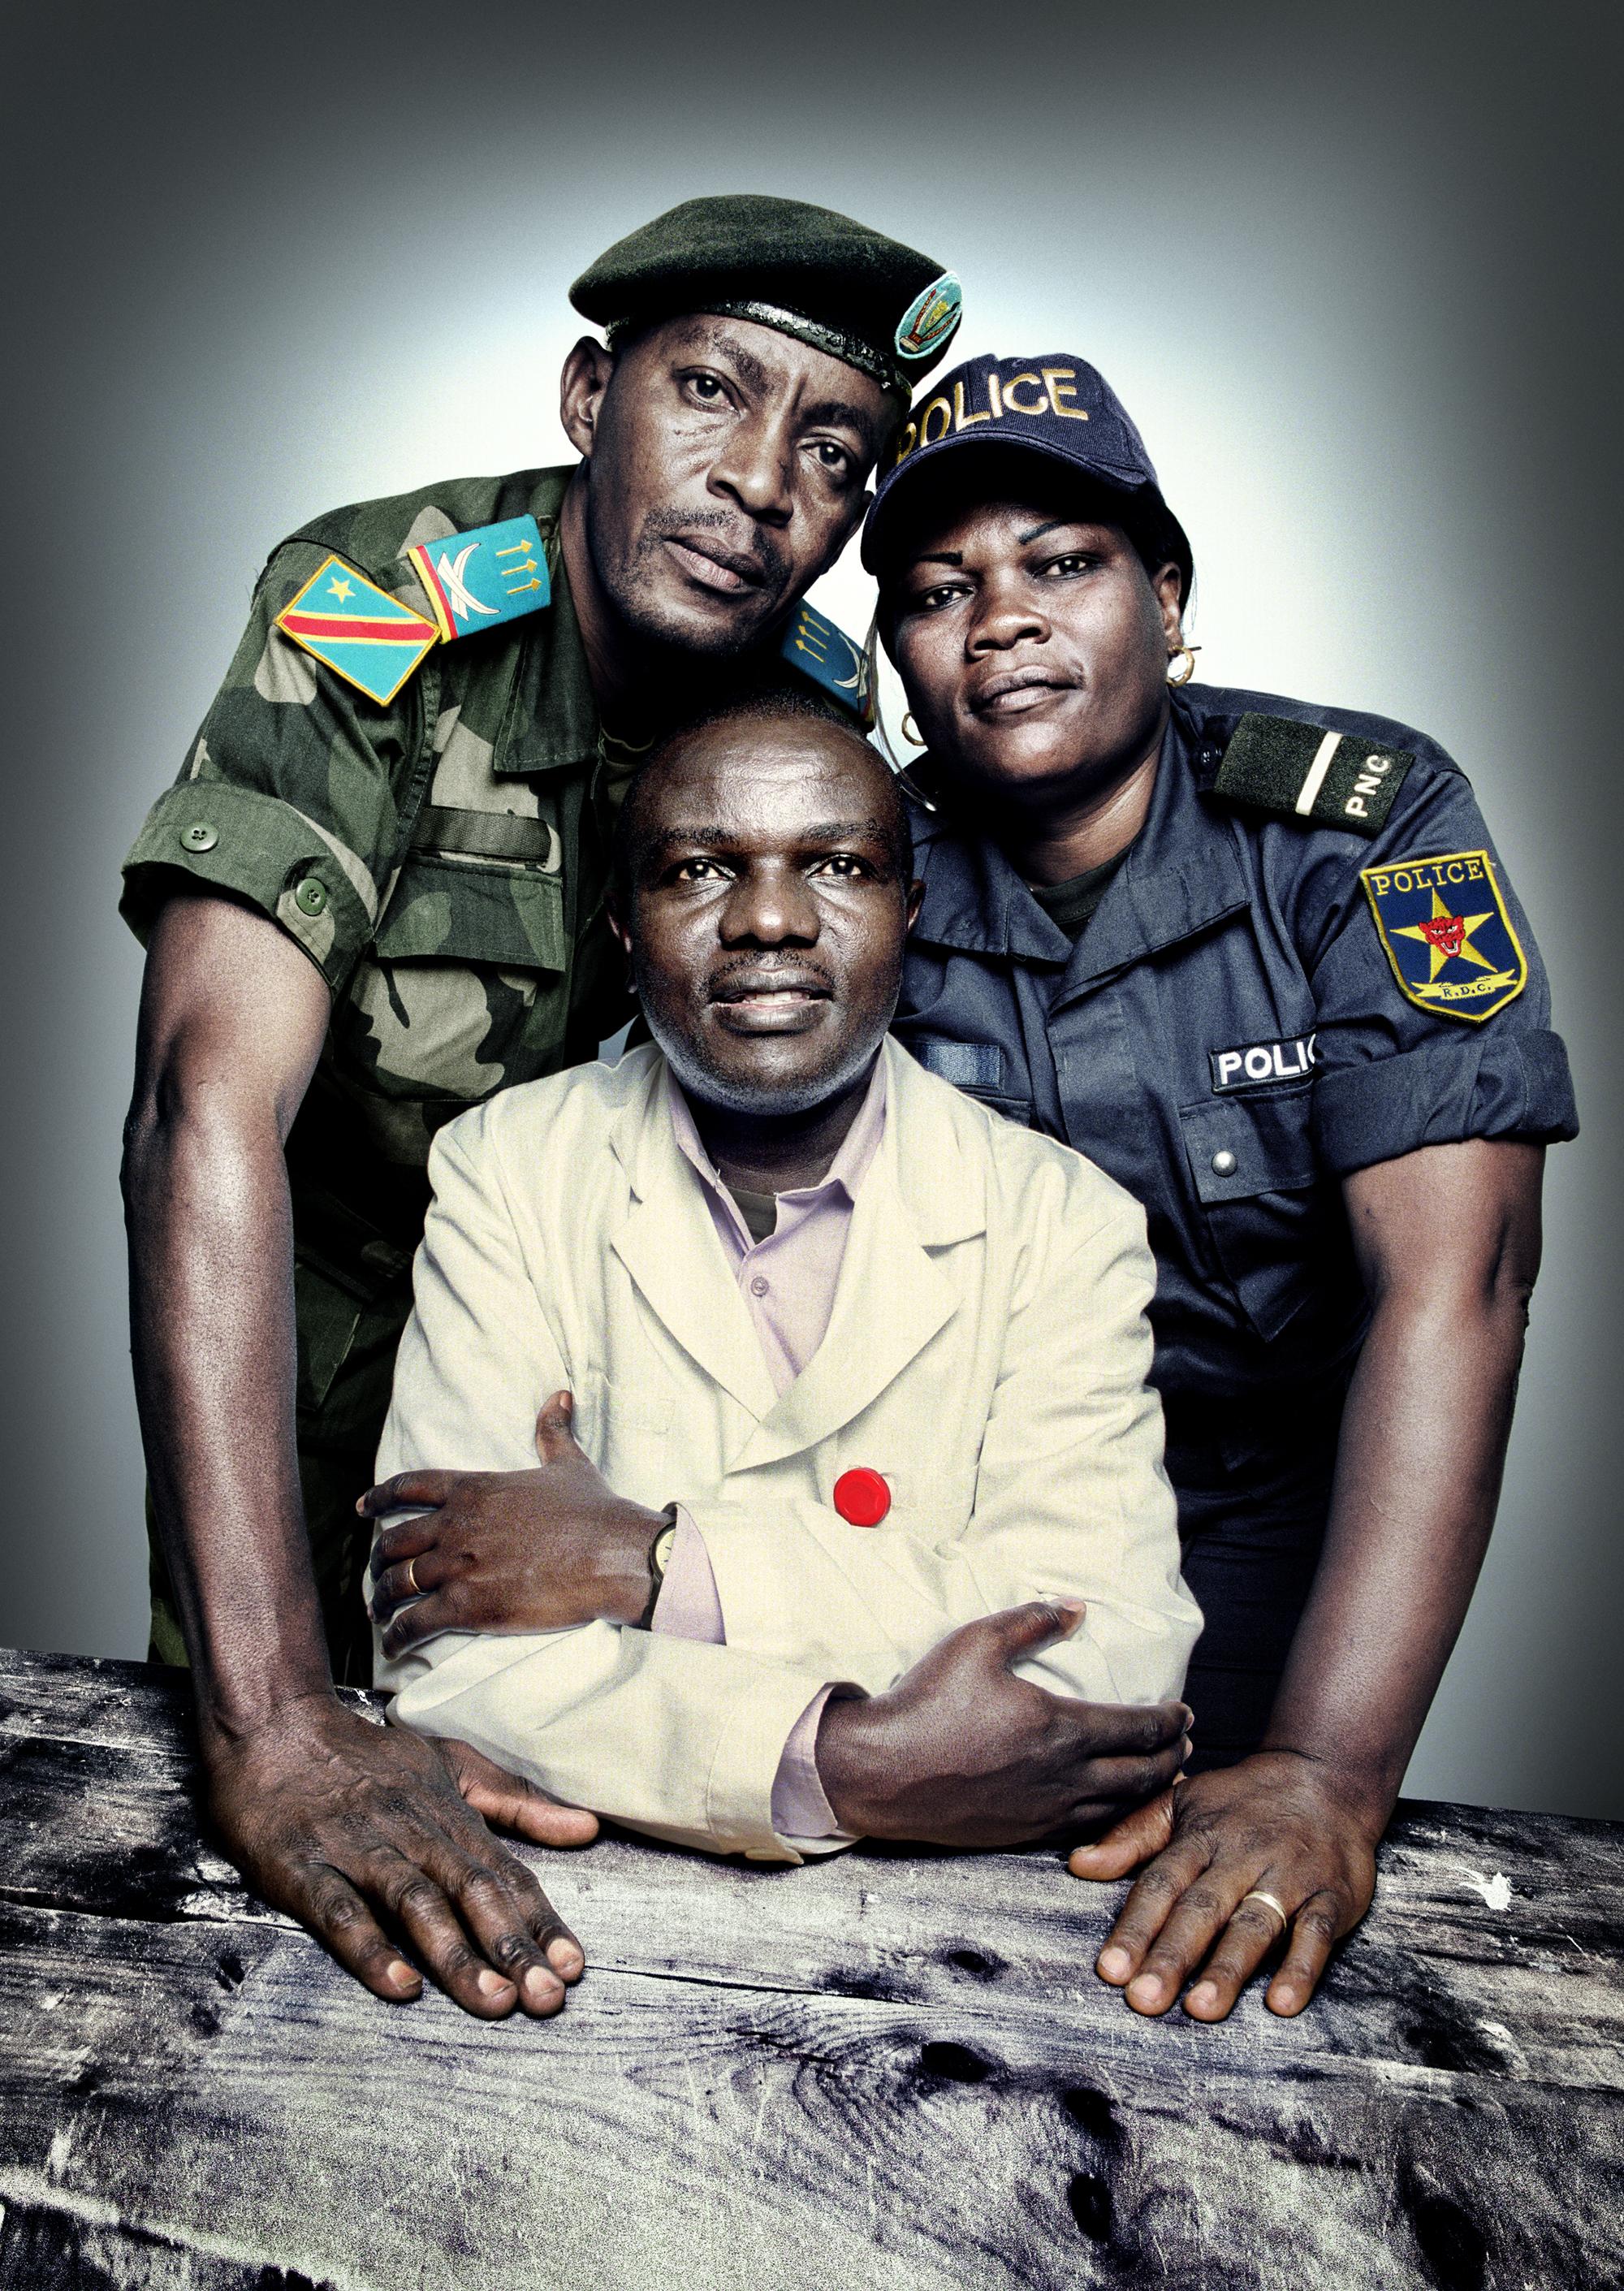 Captain David Kazadi Nzengu, 47, Dr. Désiré Alumeti, 43, and Uvoya Fwaling Honorata, 42